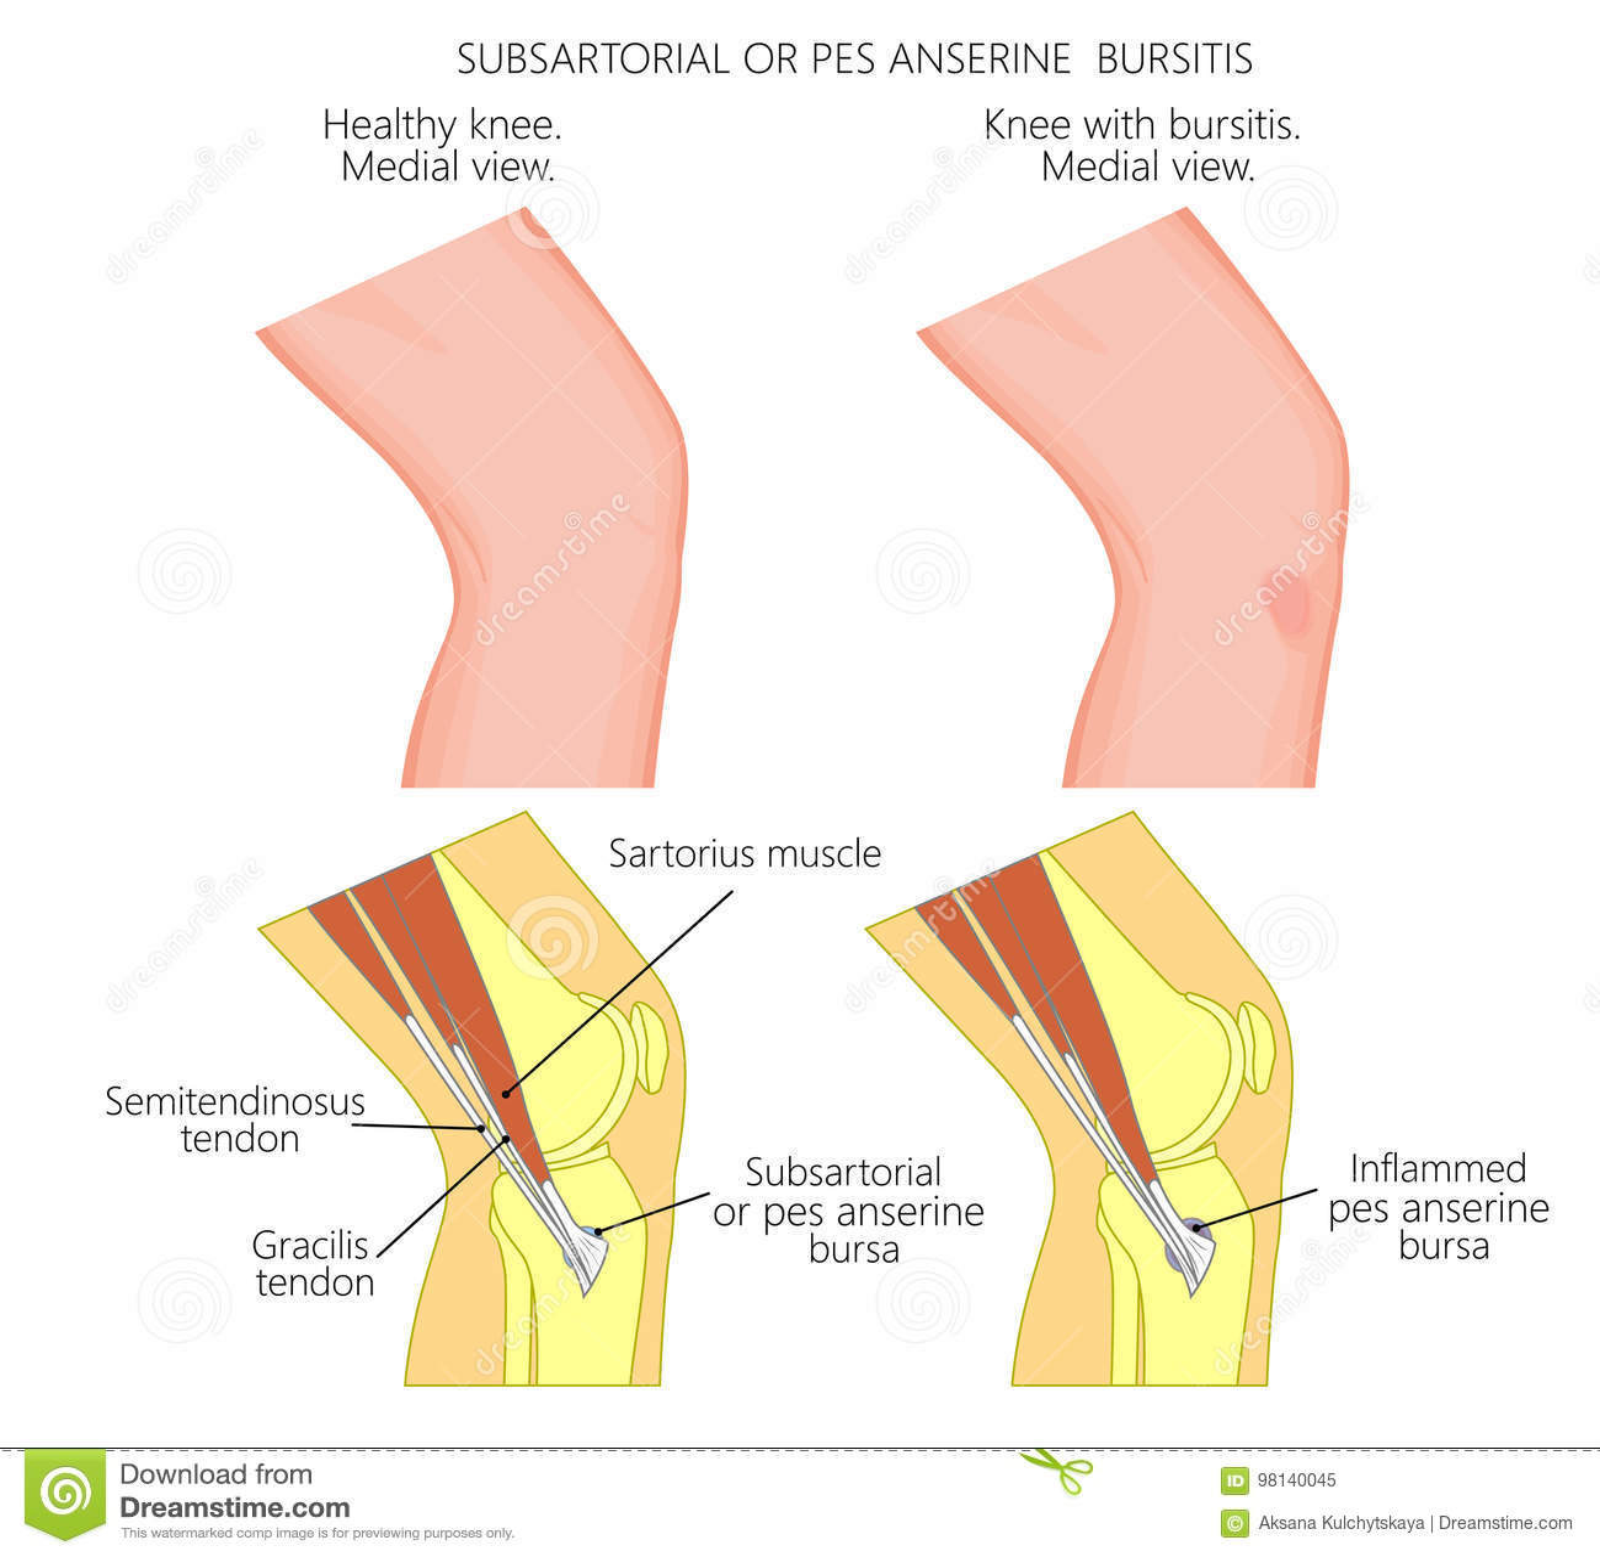 Bursite joelho